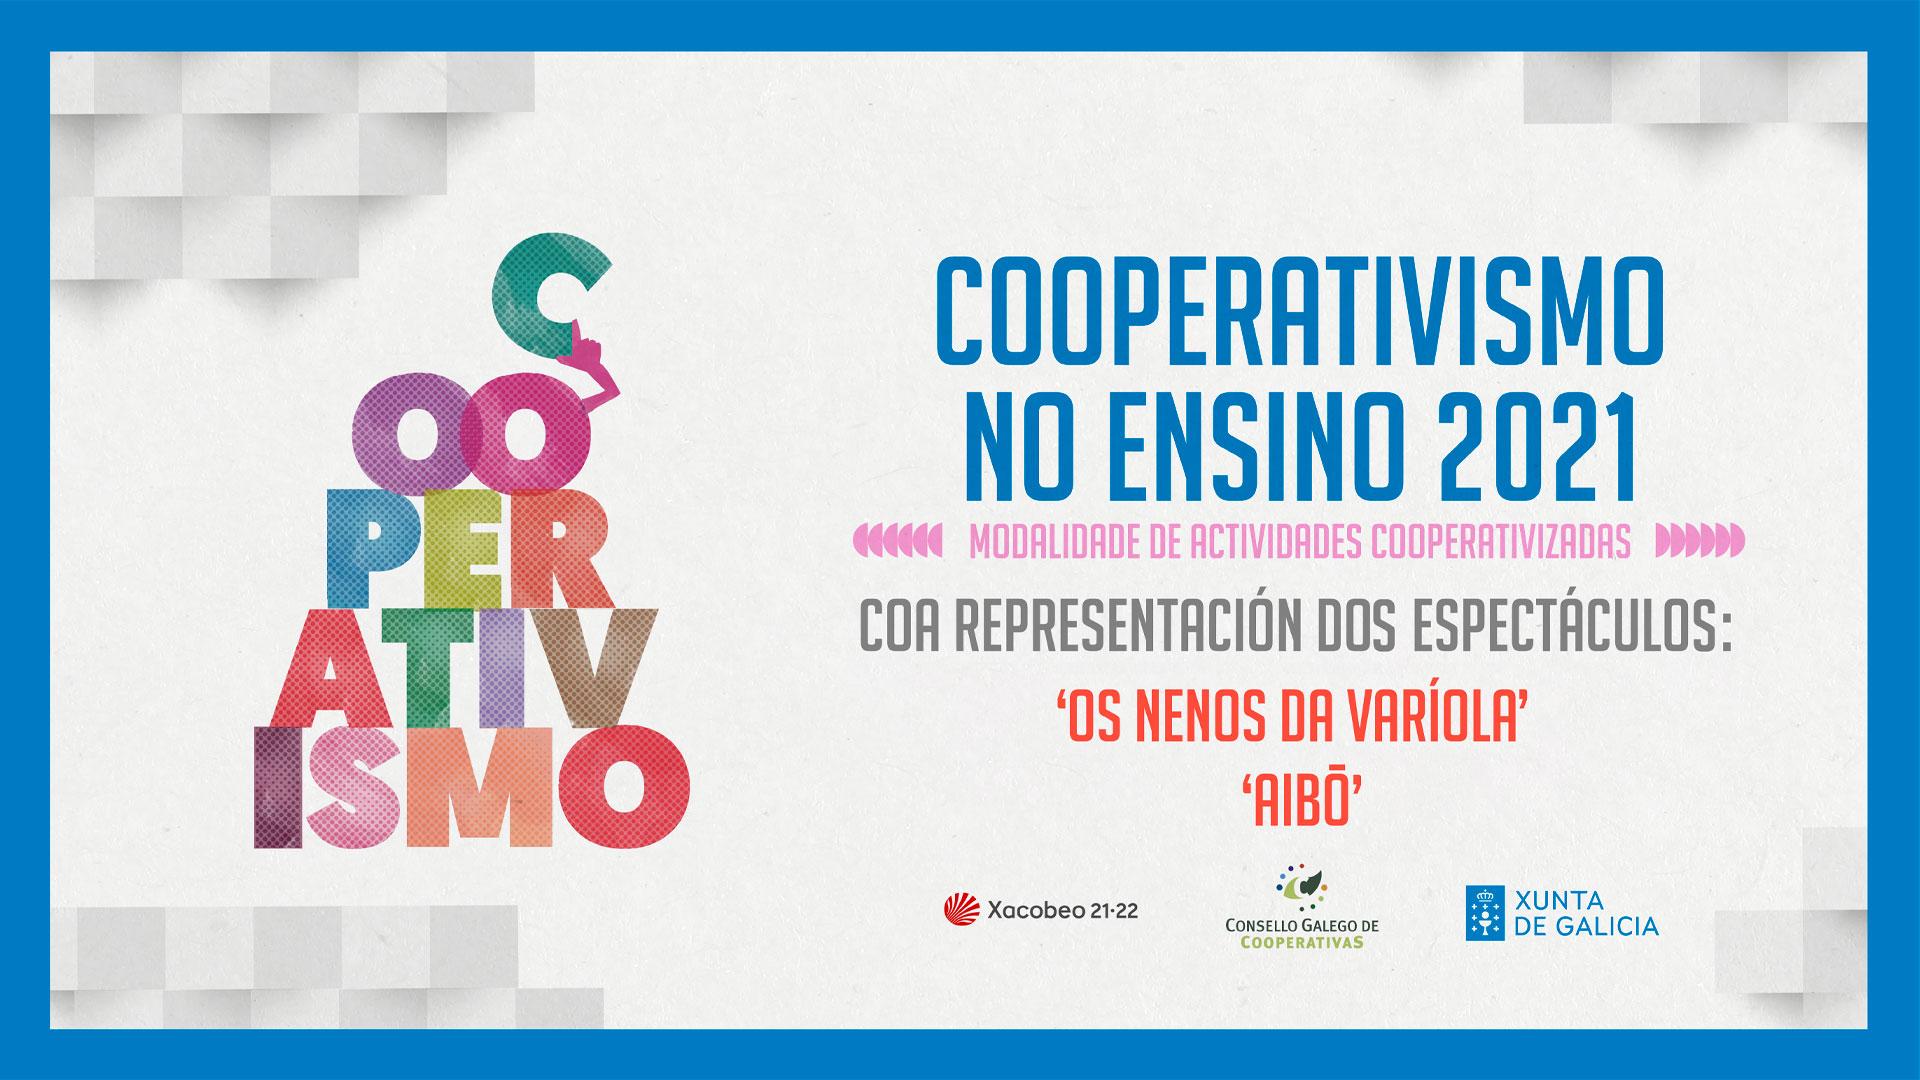 Cooperativismo no Ensino 2021